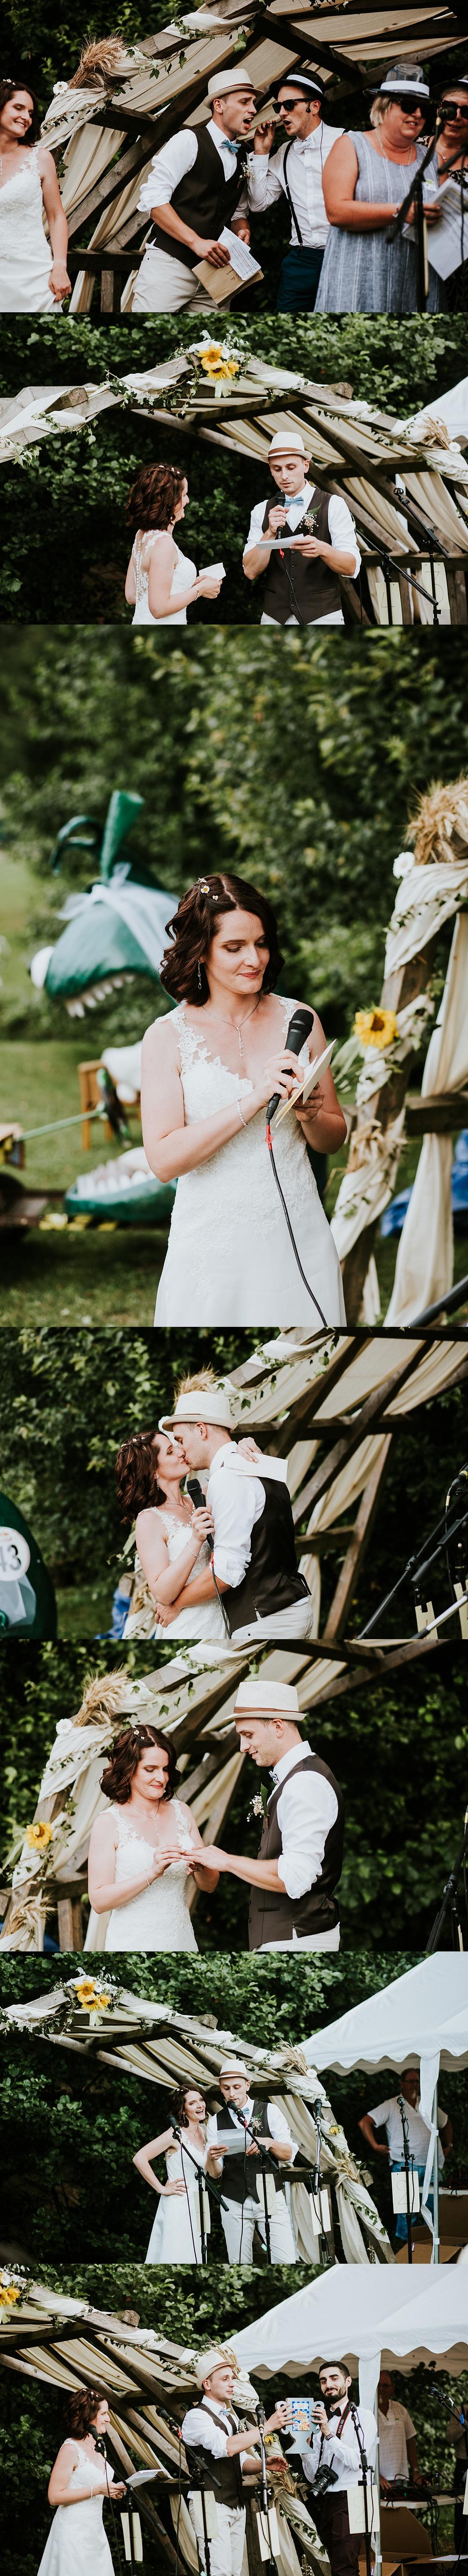 Photographe mariage champêtre Alsace Strasbourg